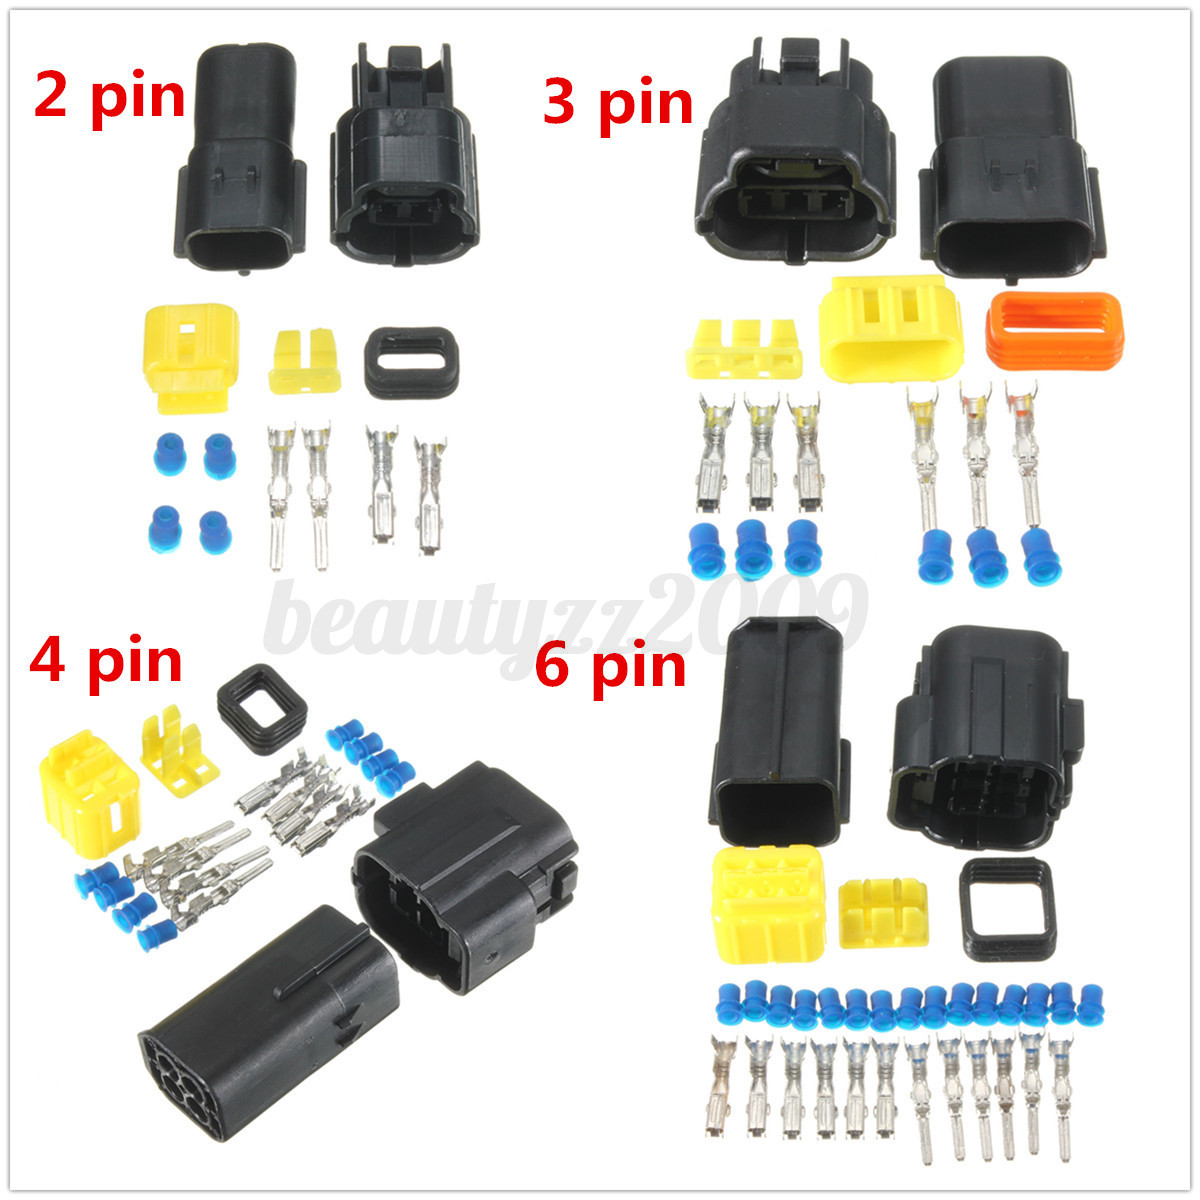 69D726569E578B86A70085CDCFCFC6D6CECDAE83CE73C90333D29C46CE23CCD2CC43439DEDD223669C33D2C826FC569393663656C89D1ECDC8A023 2 3 4 6 pin waterproof electrical car auto wiring cable connectors vehicle wiring connectors at honlapkeszites.co